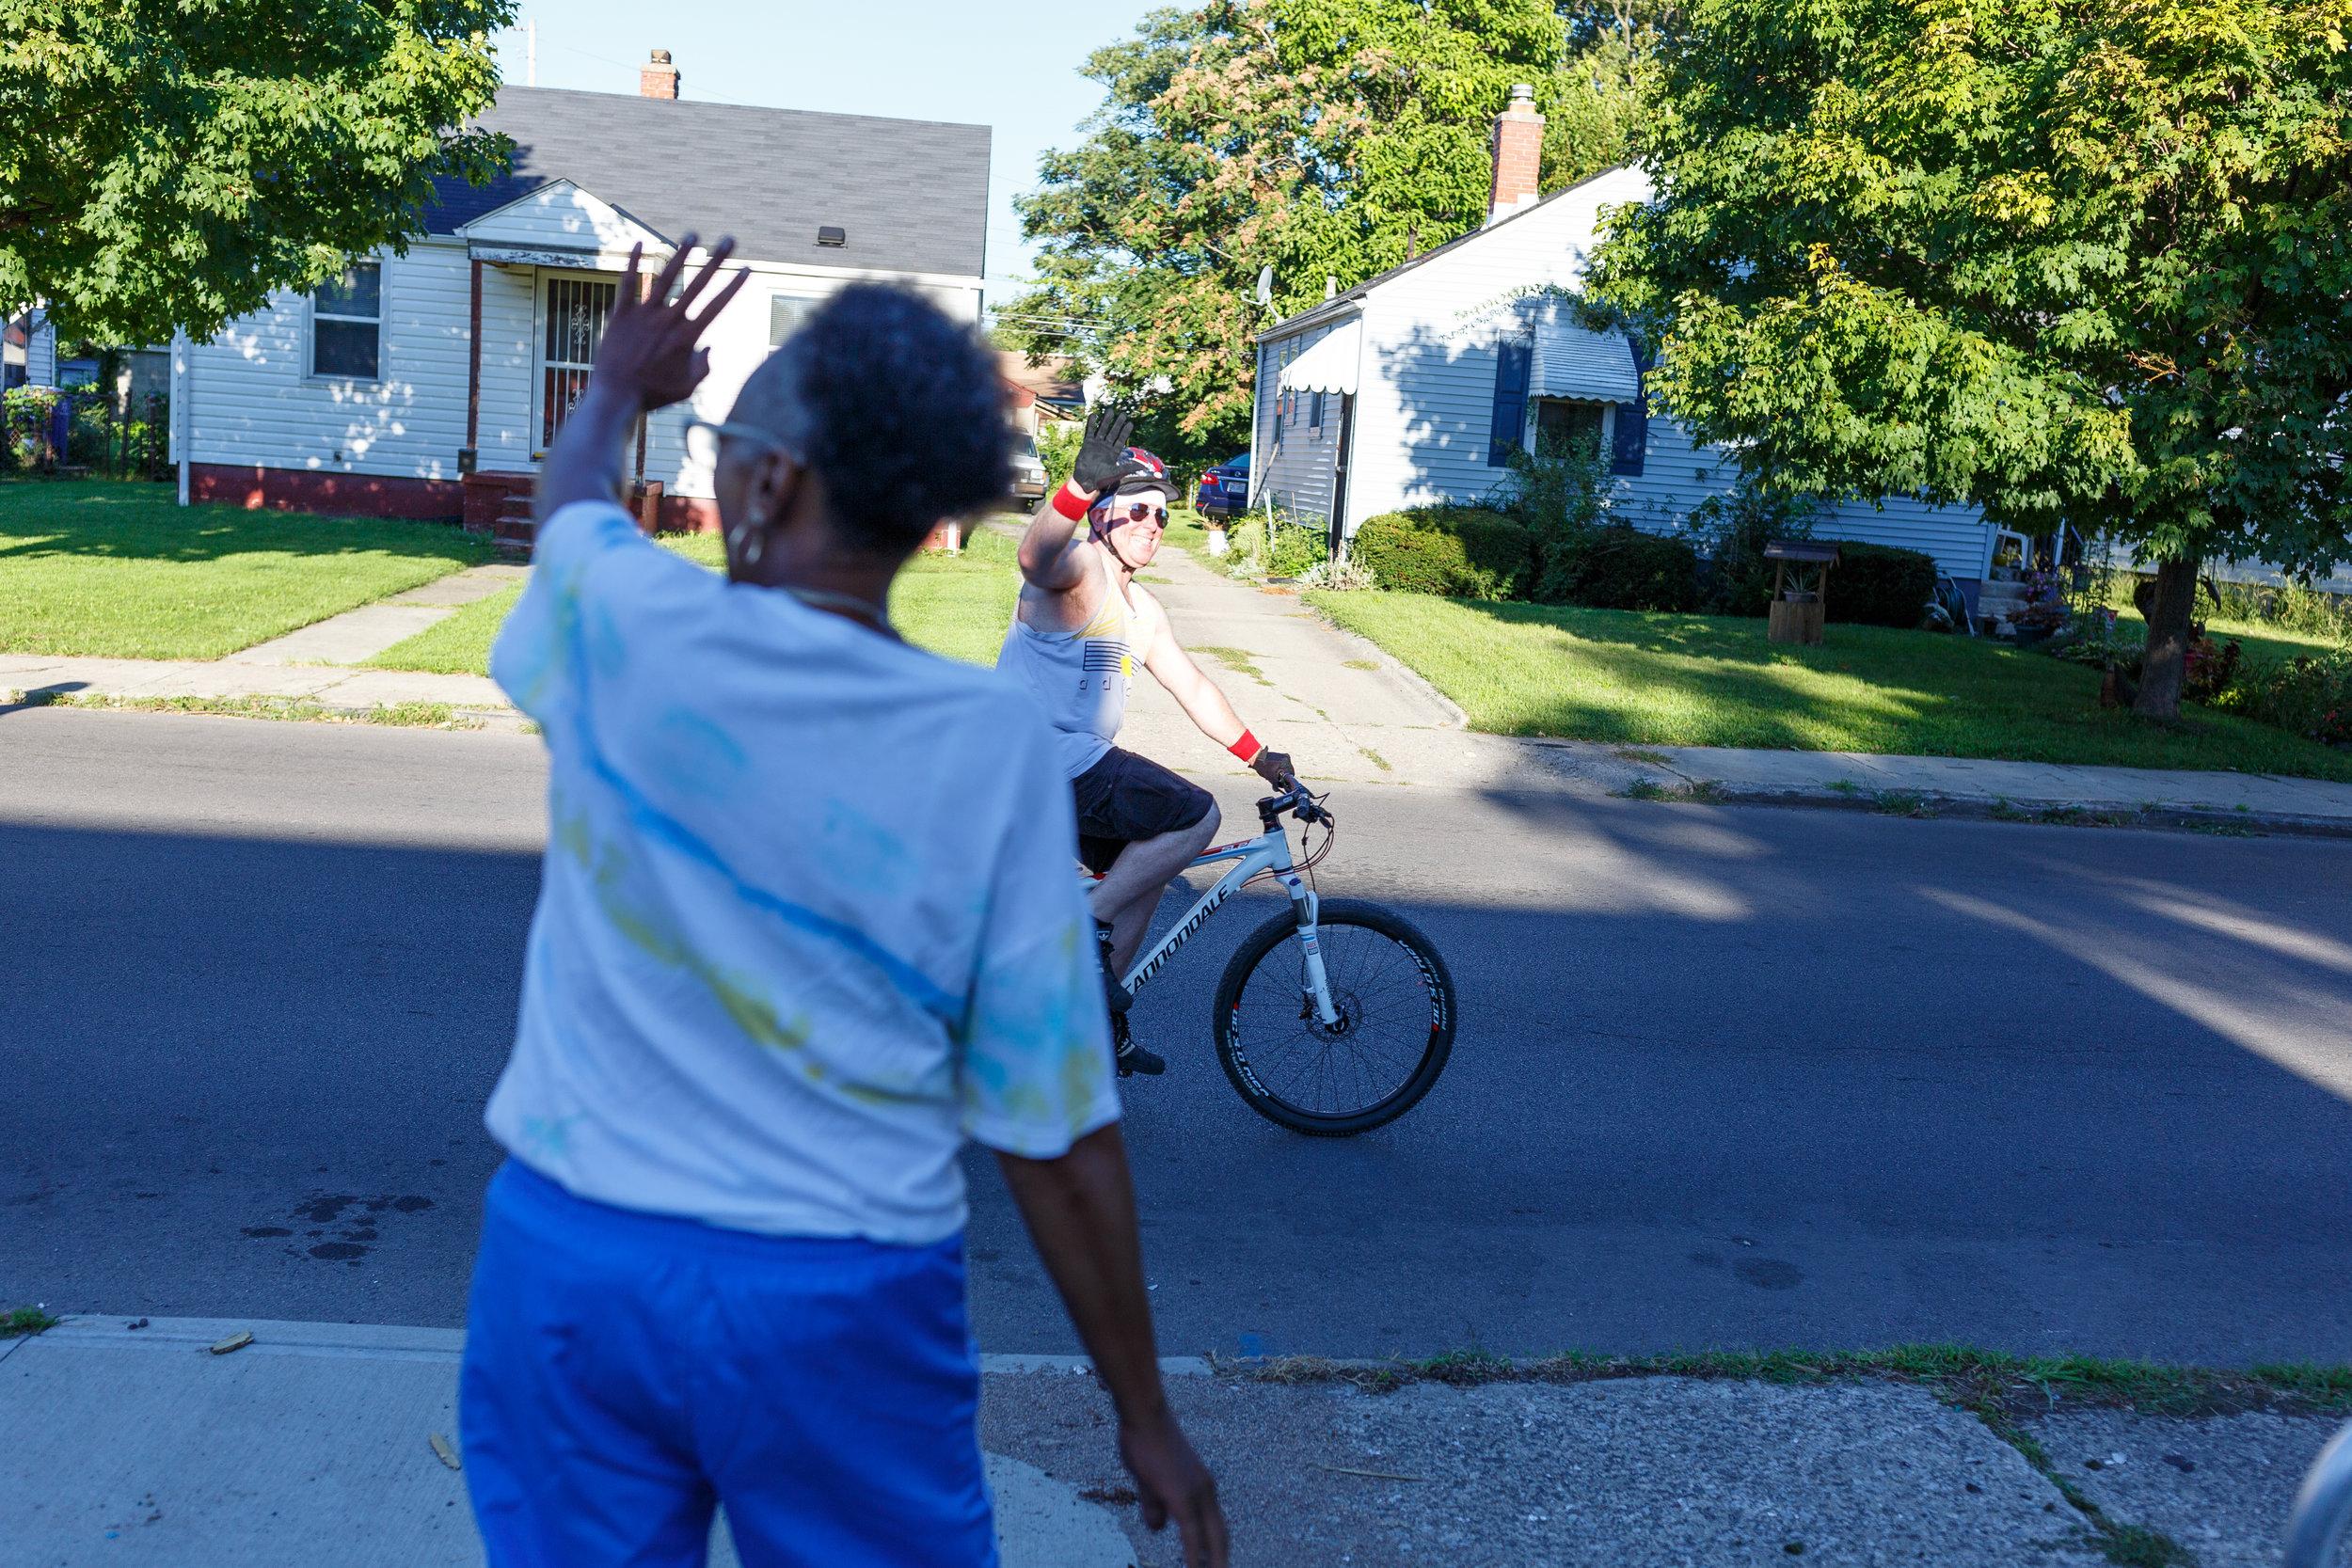 A friendly hello greets a Bike the Cbus rider. Photo credit: Ben Ko